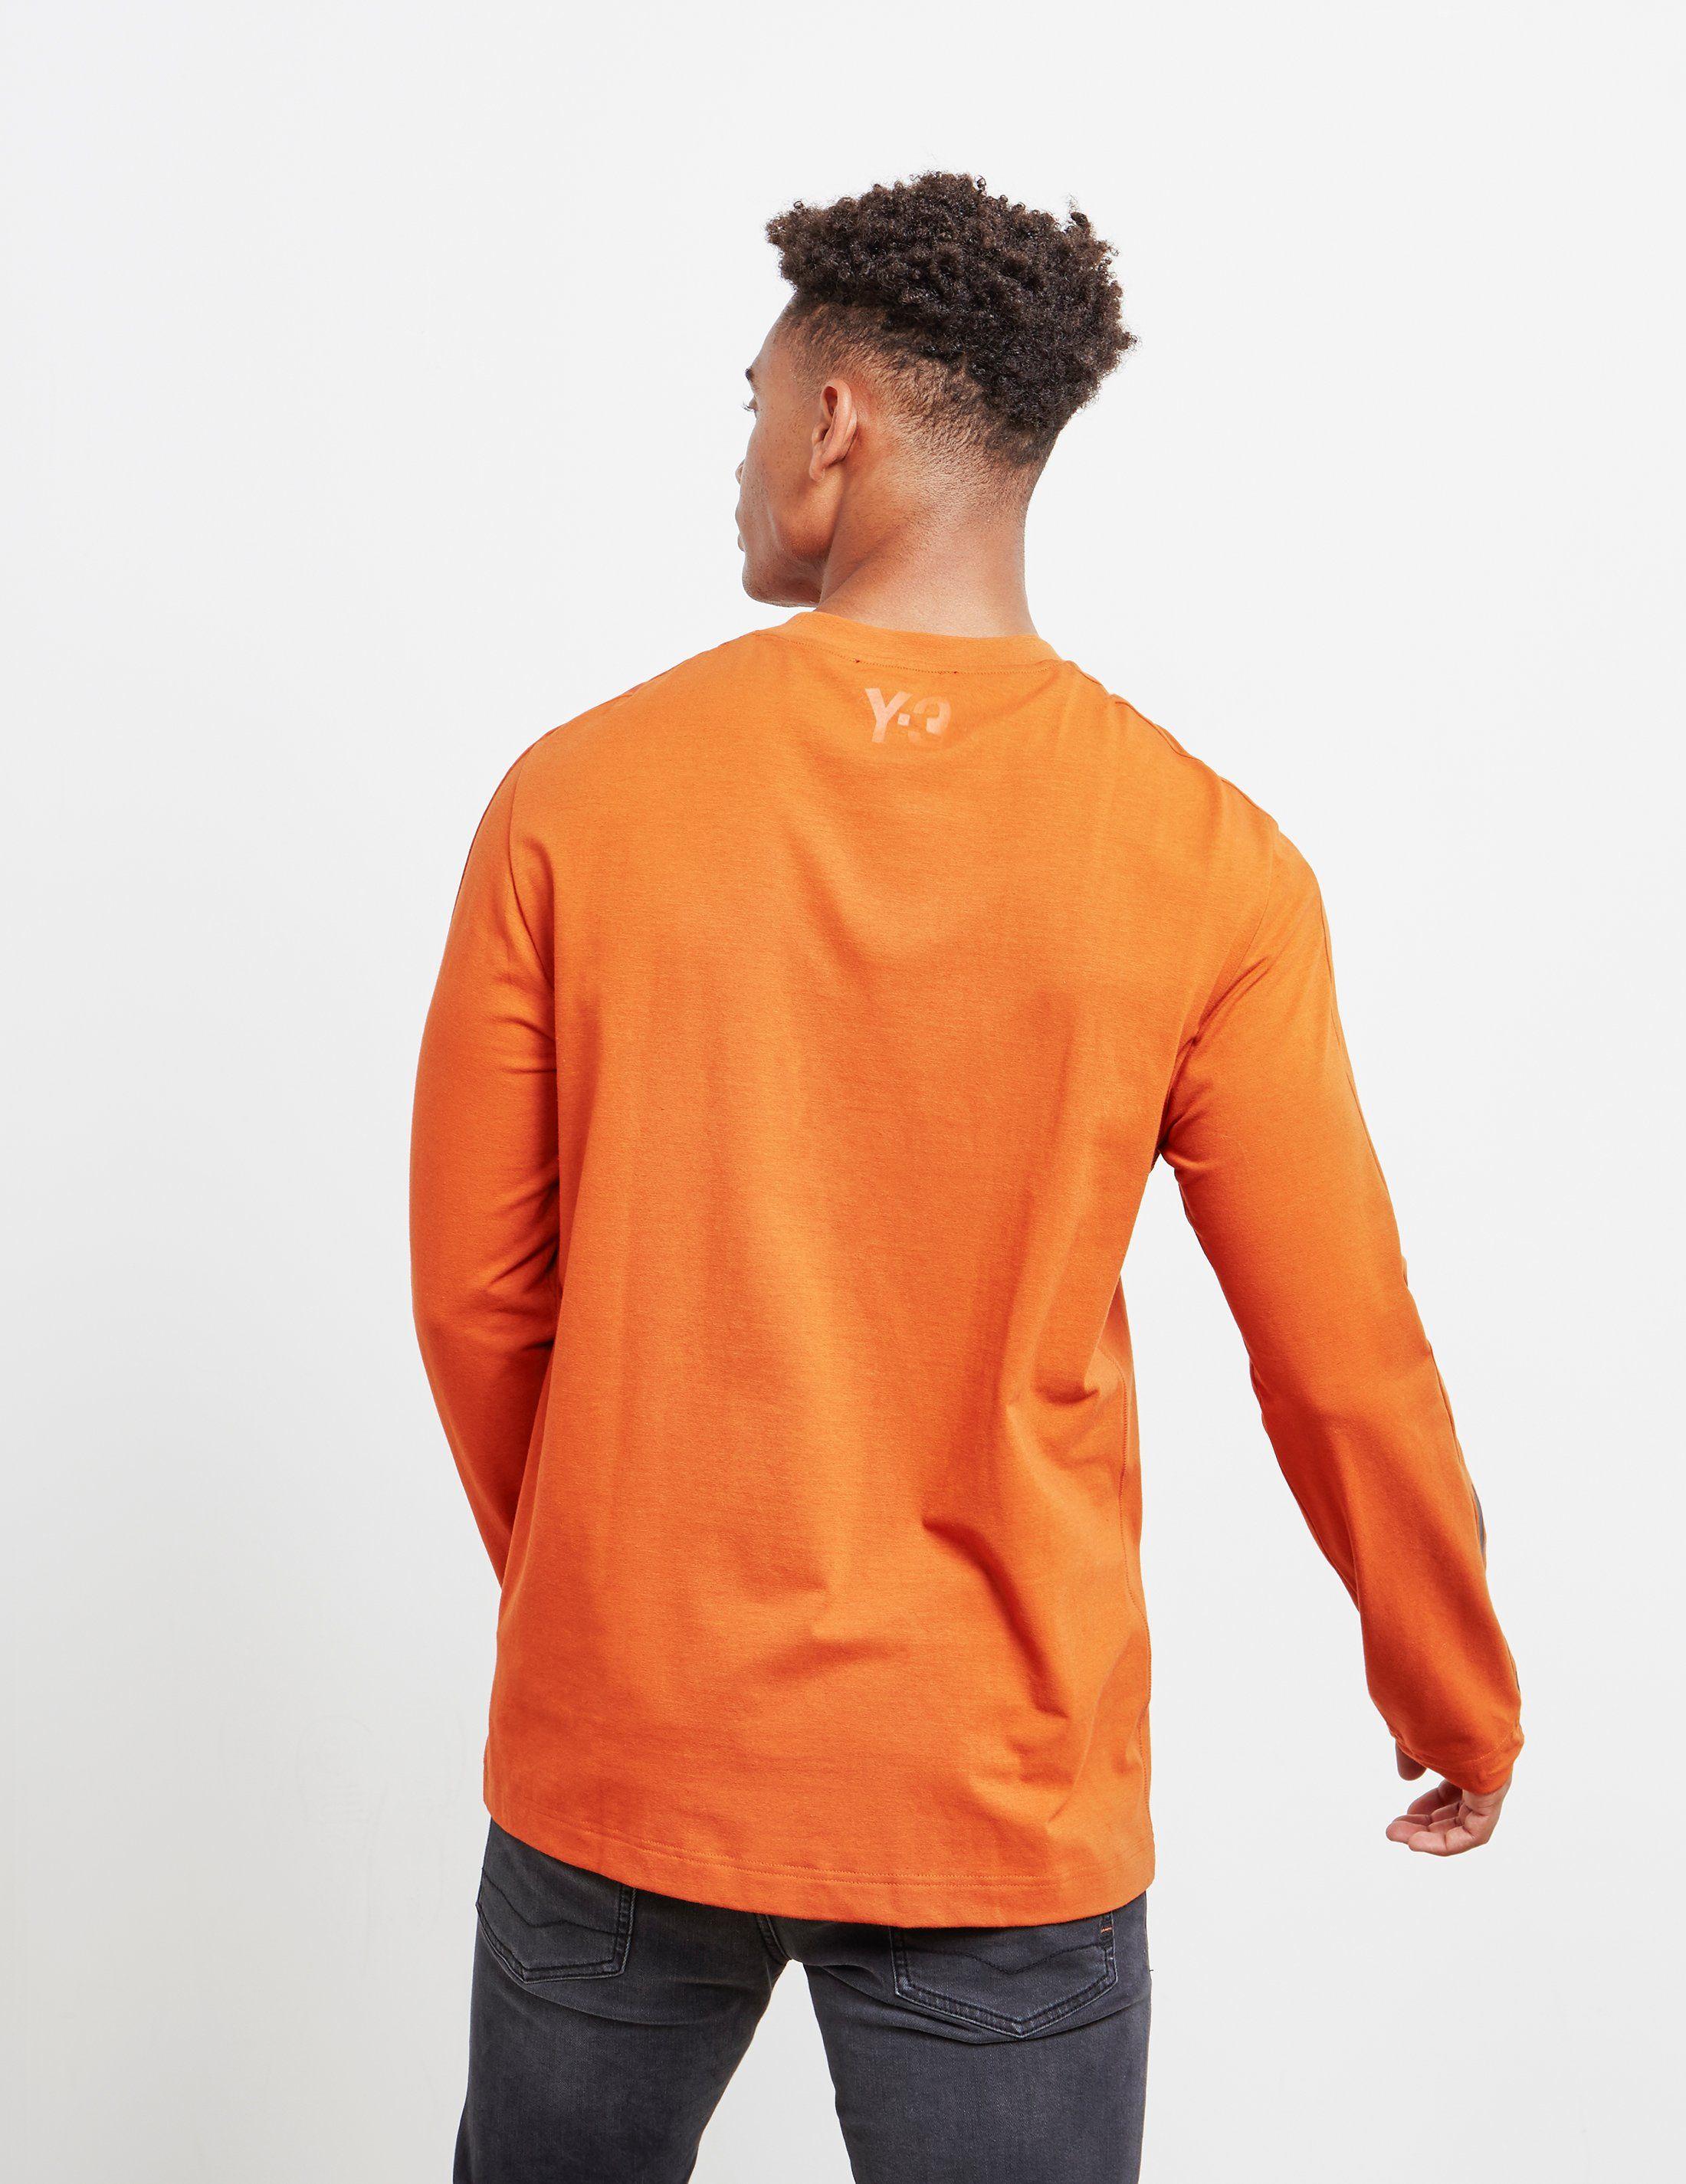 Y-3 Stripe Long Sleeve T-Shirt - Online Exclusive